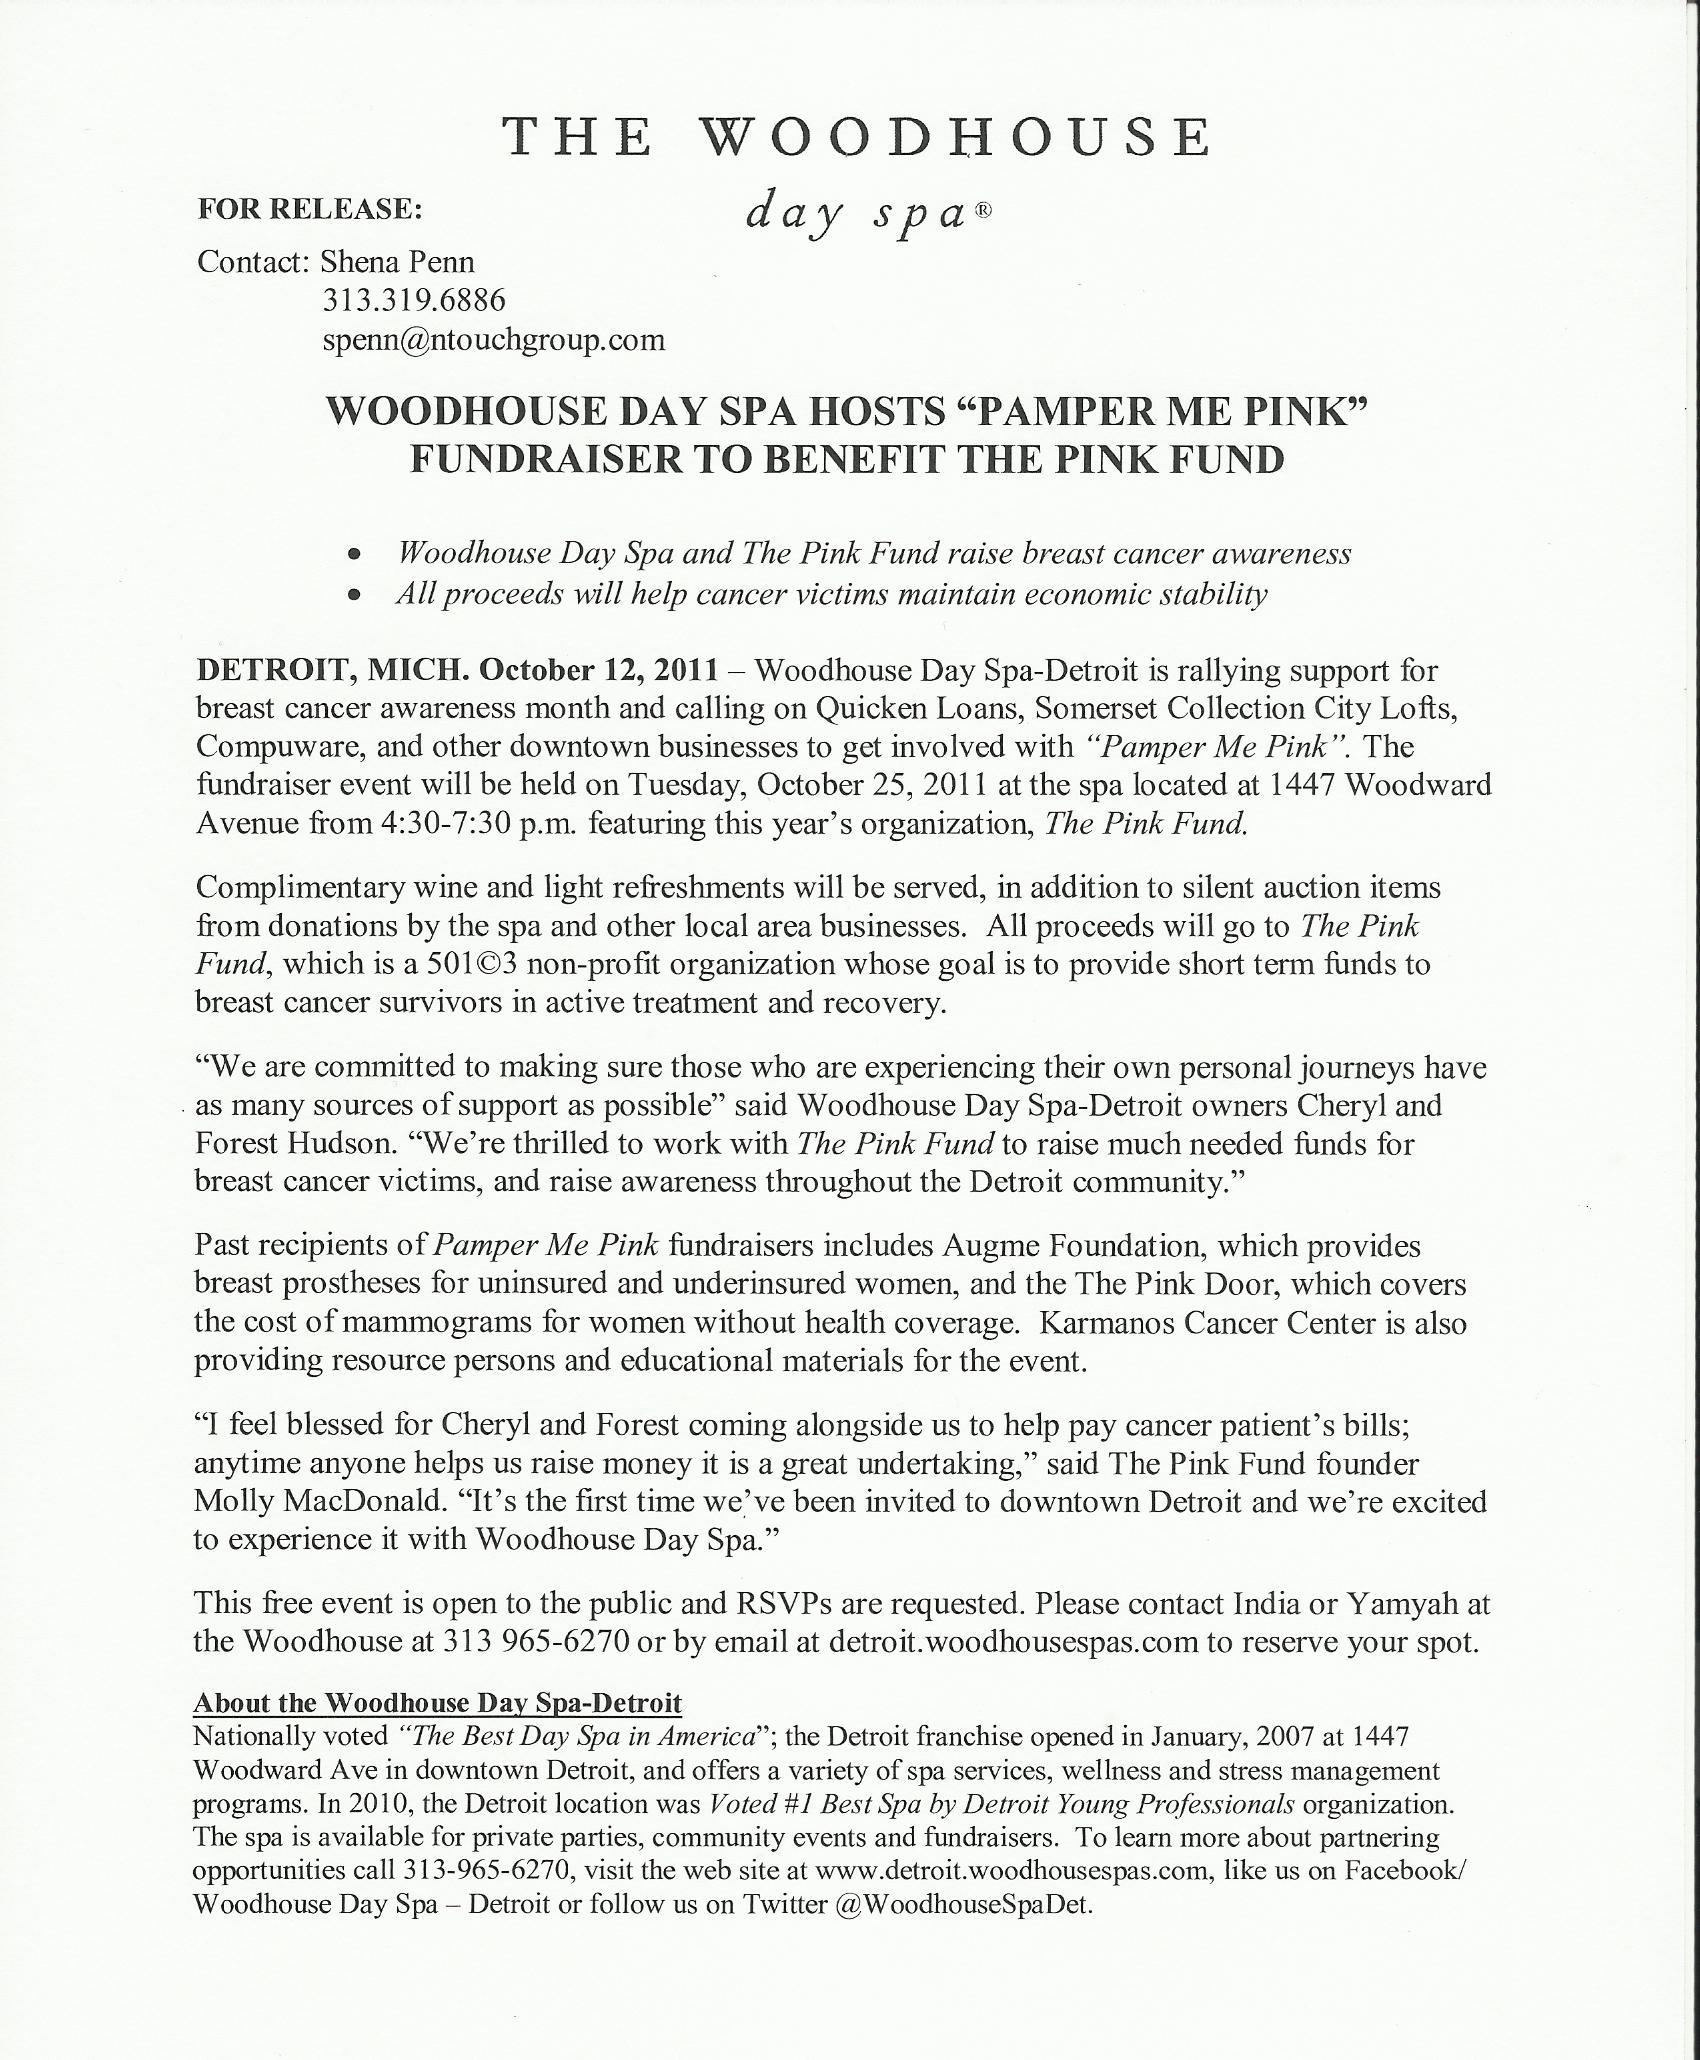 Press Release Samples | Shena Penn